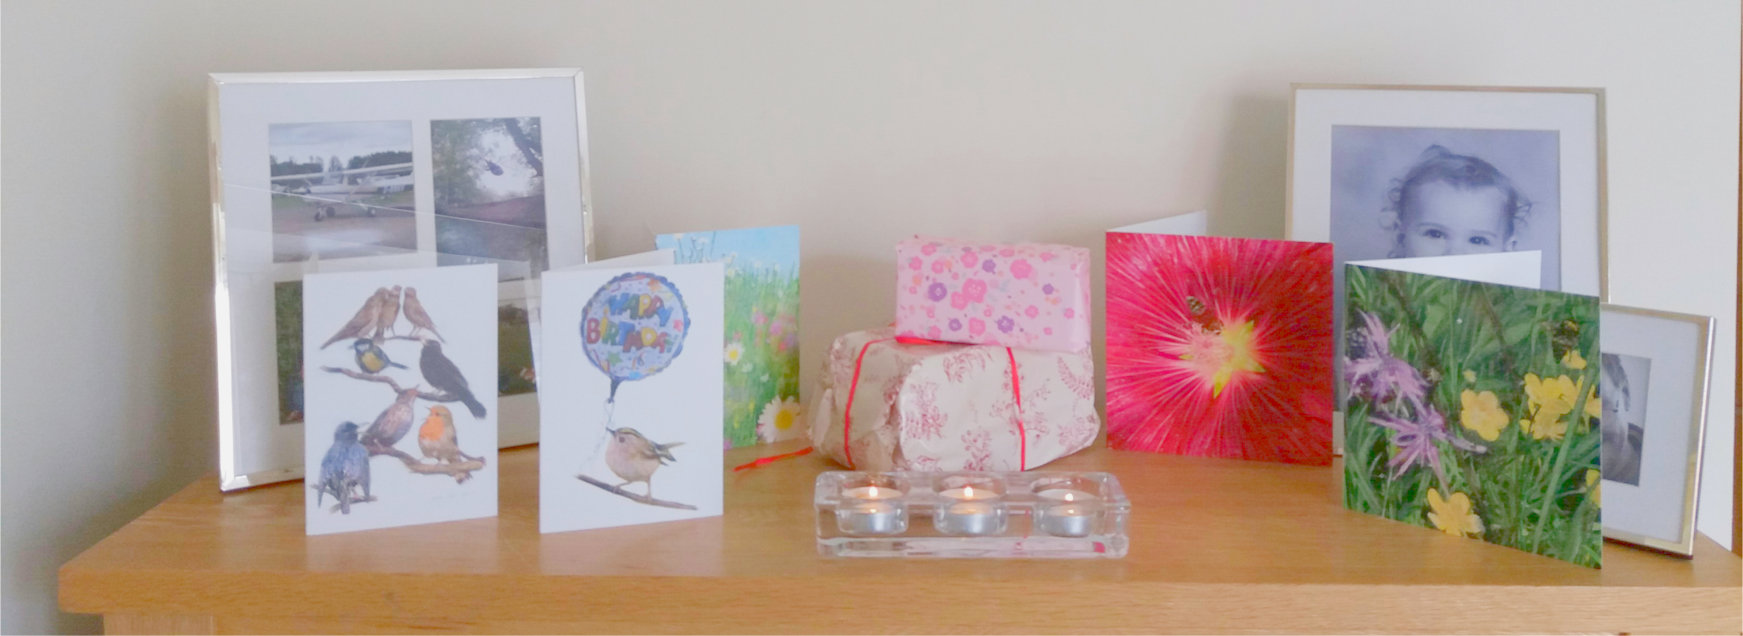 greeting-cards-banner2.jpg